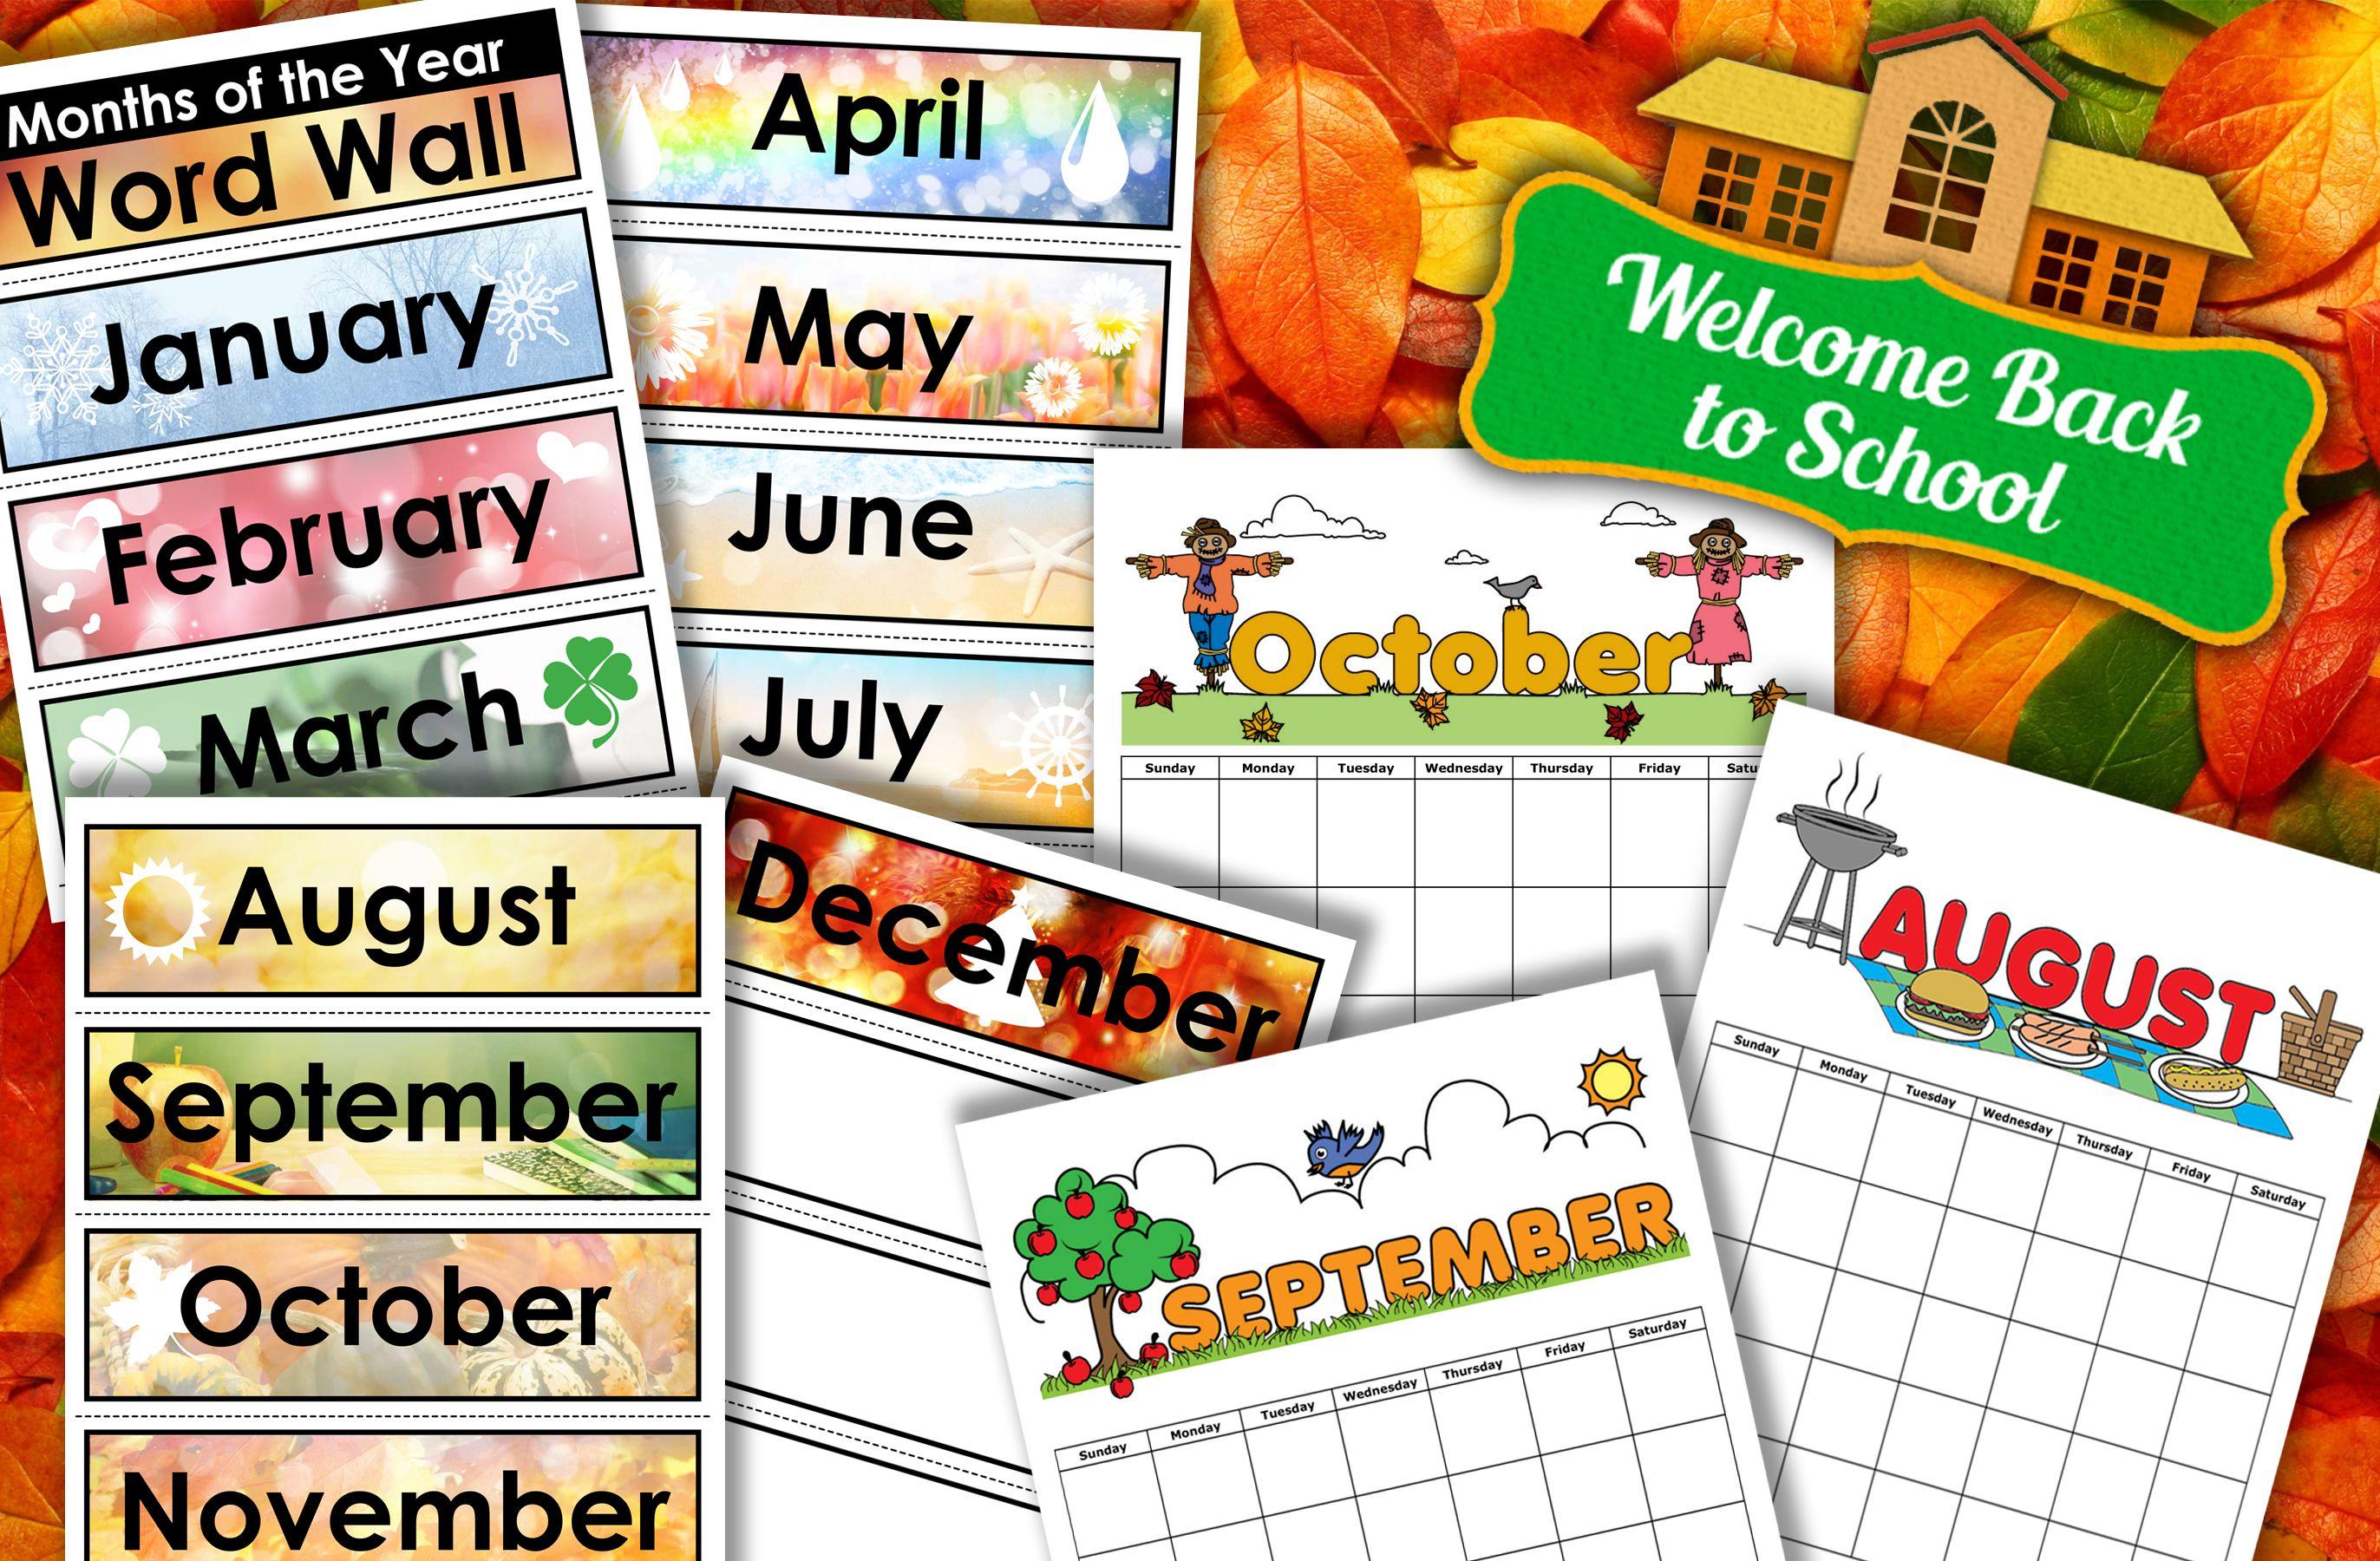 Print Out Fun Seasonal Calendars From